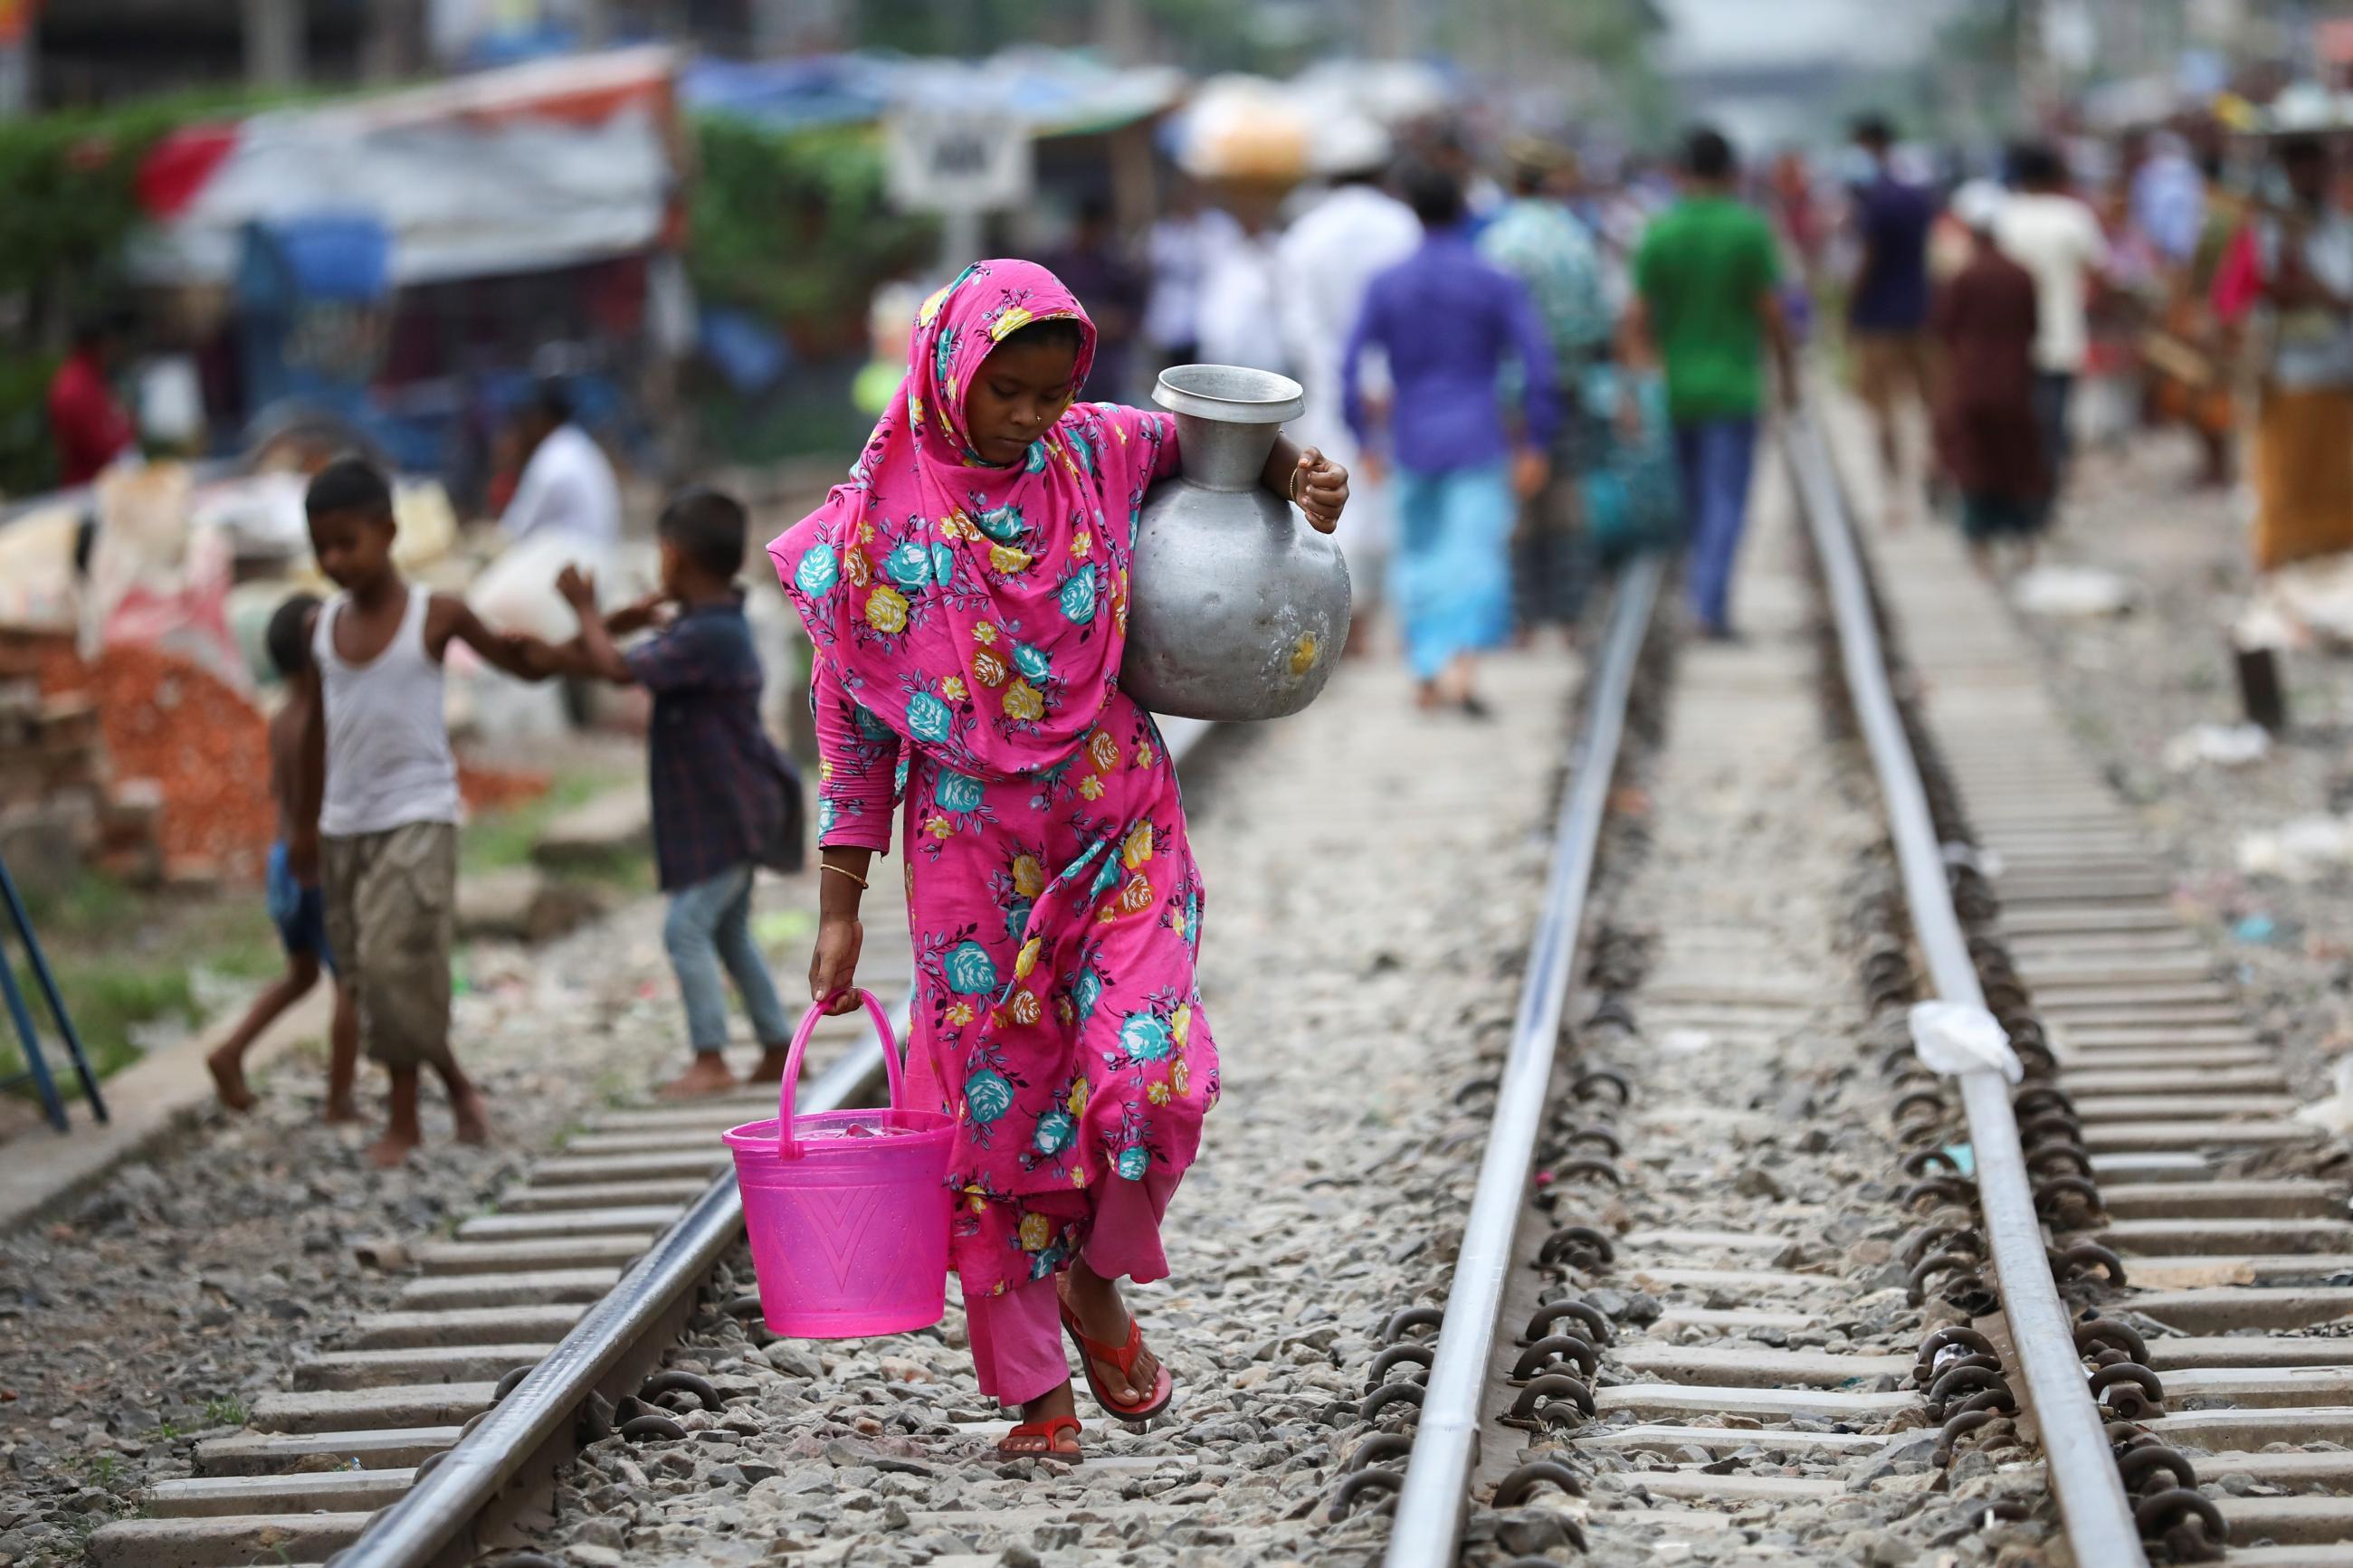 A slum dweller woman carries drinking water in Dhaka, Bangladesh, September 15, 2020. REUTERS/Mohammad Ponir Hossain